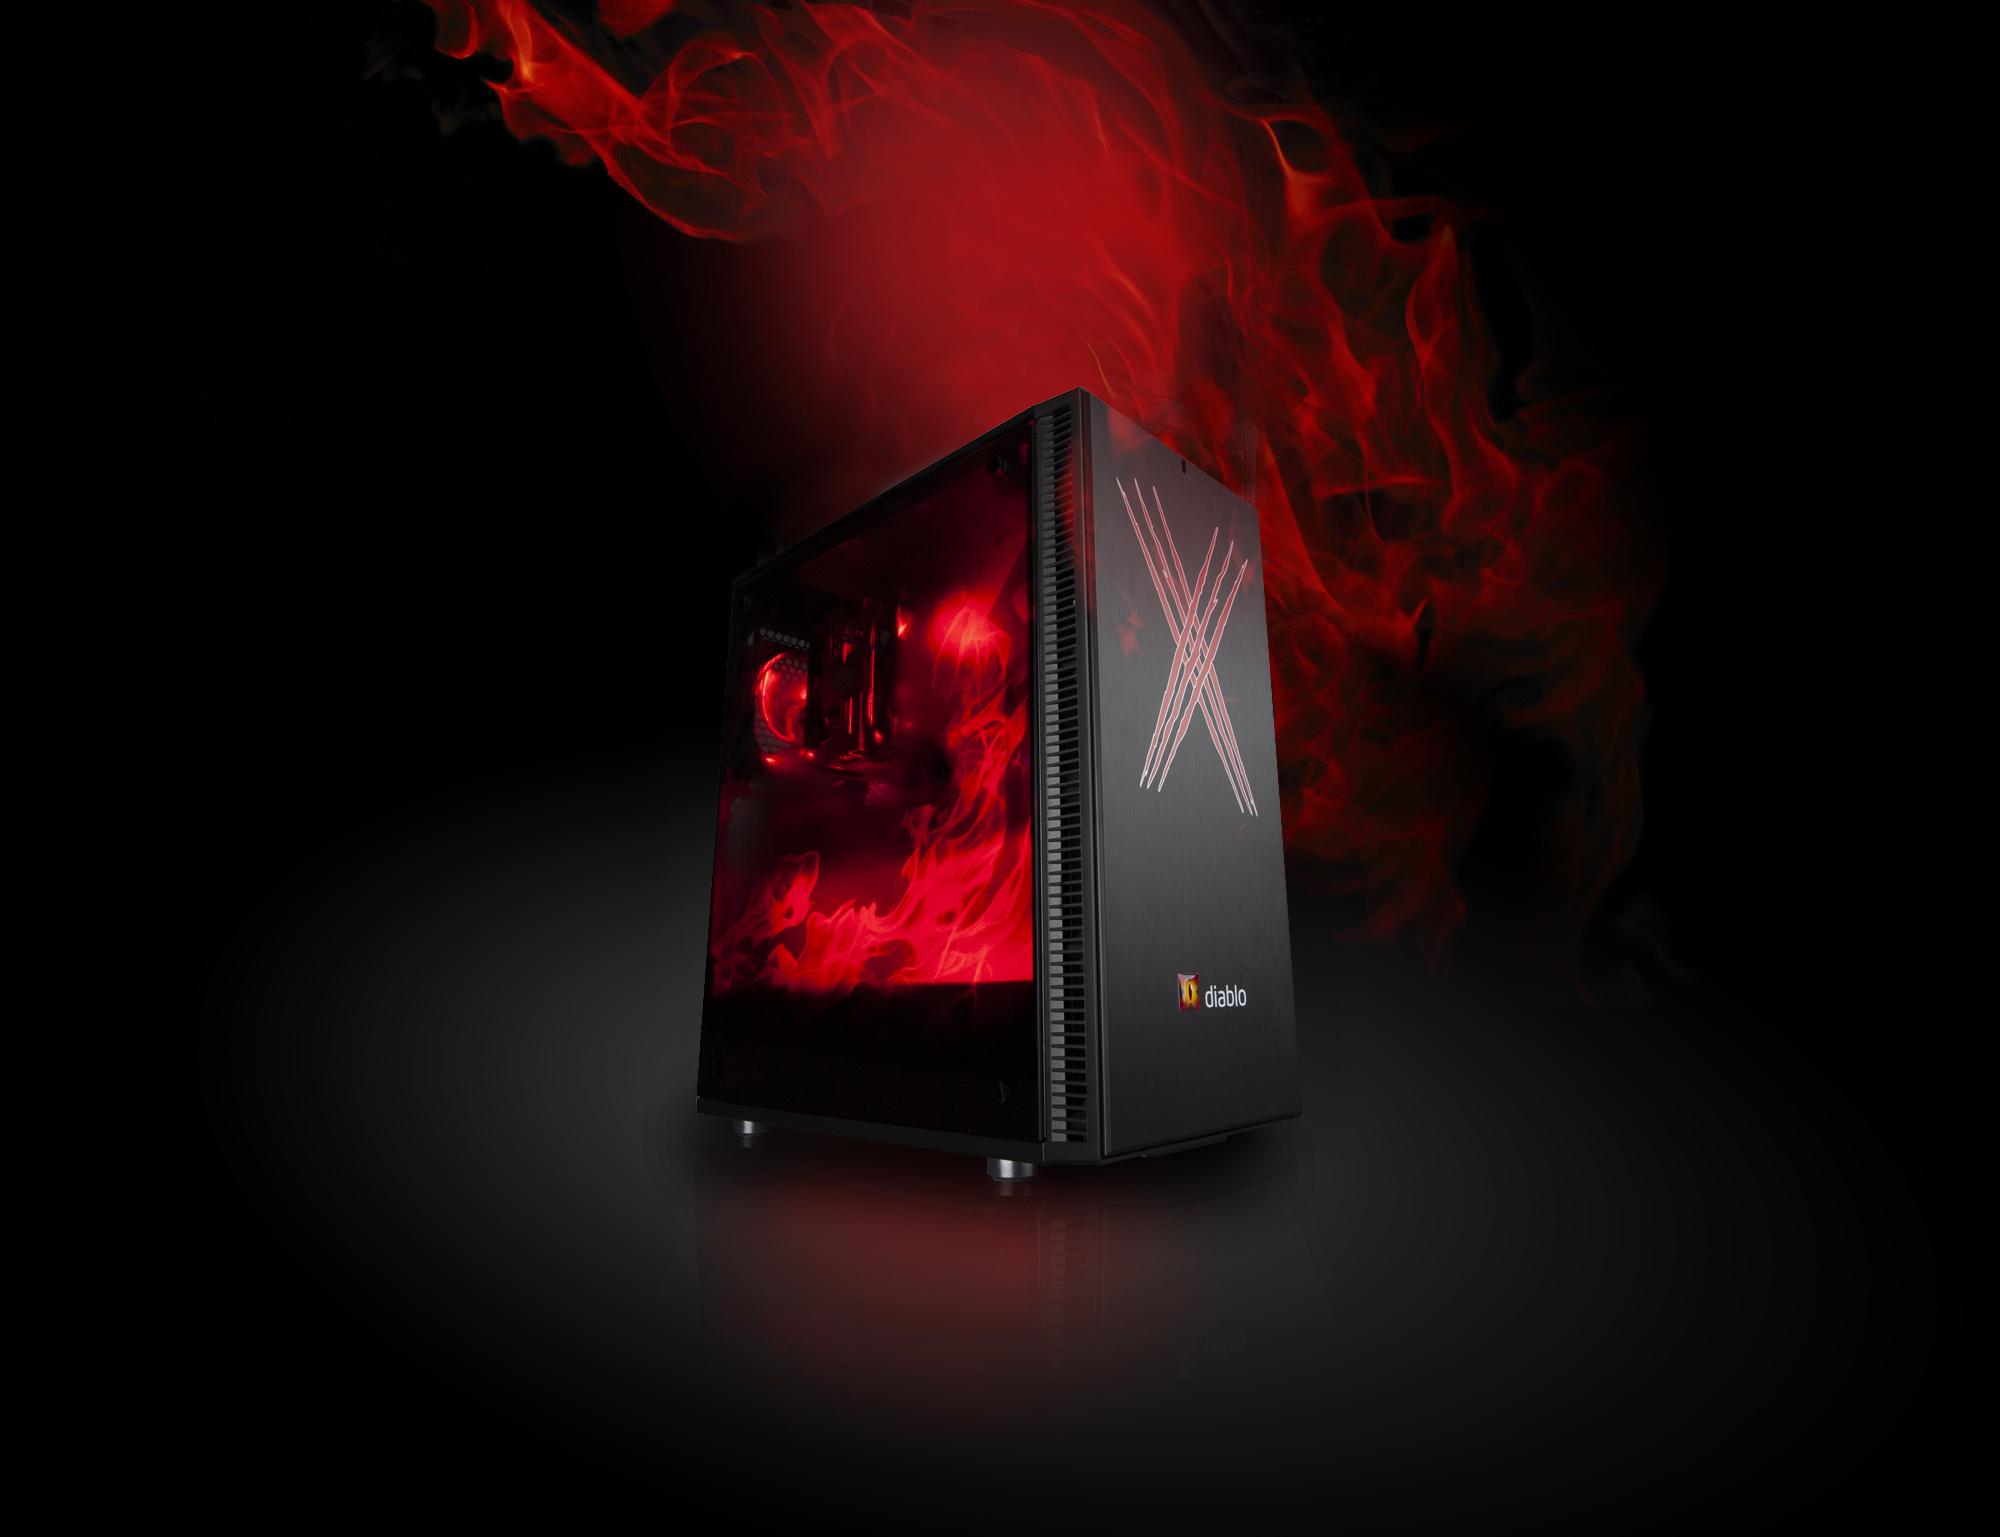 X-DIABLO Gamer X56 3060 (R5 5600X/16GB/SSD 1000GB NVME/RTX3060/W10/Wifi/LED/KB+M)